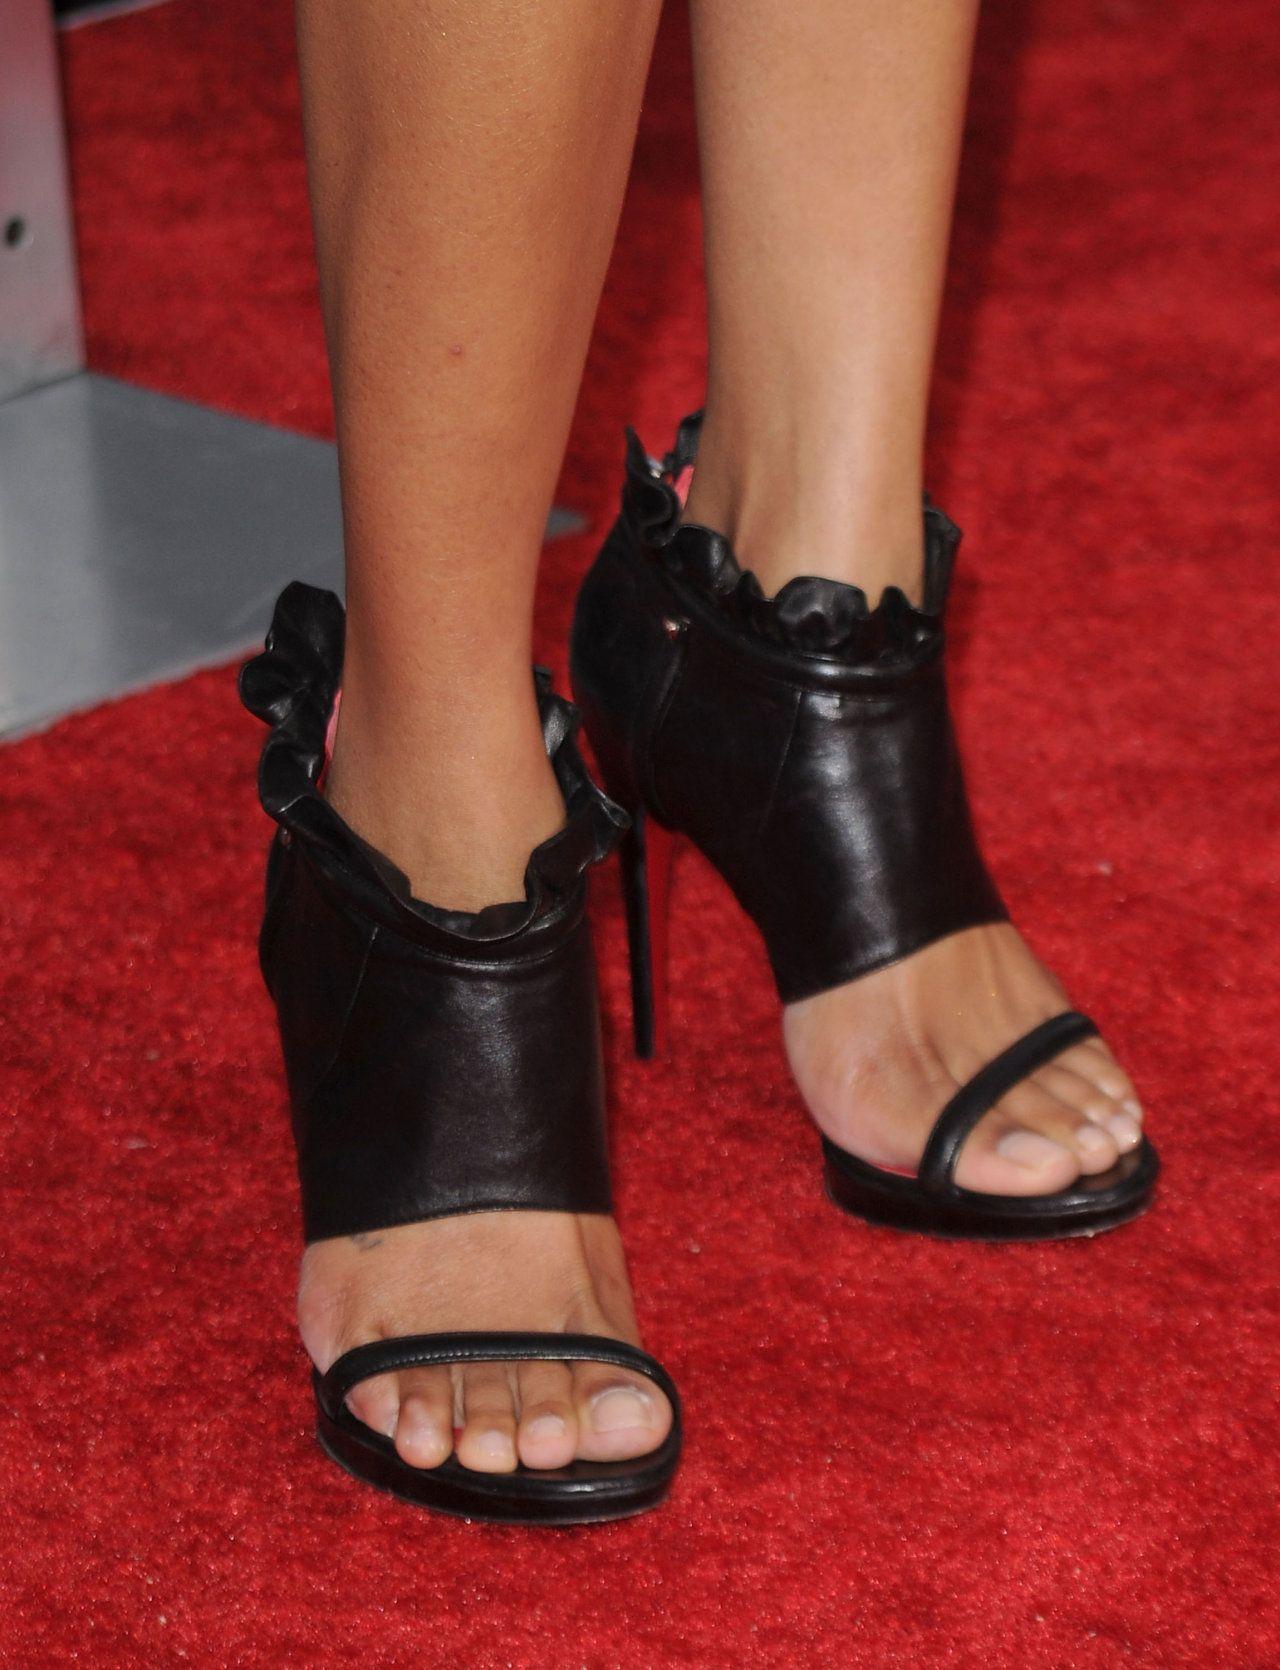 Naomi Campbell Feet Piedi E Scarpe Looks At His Feet